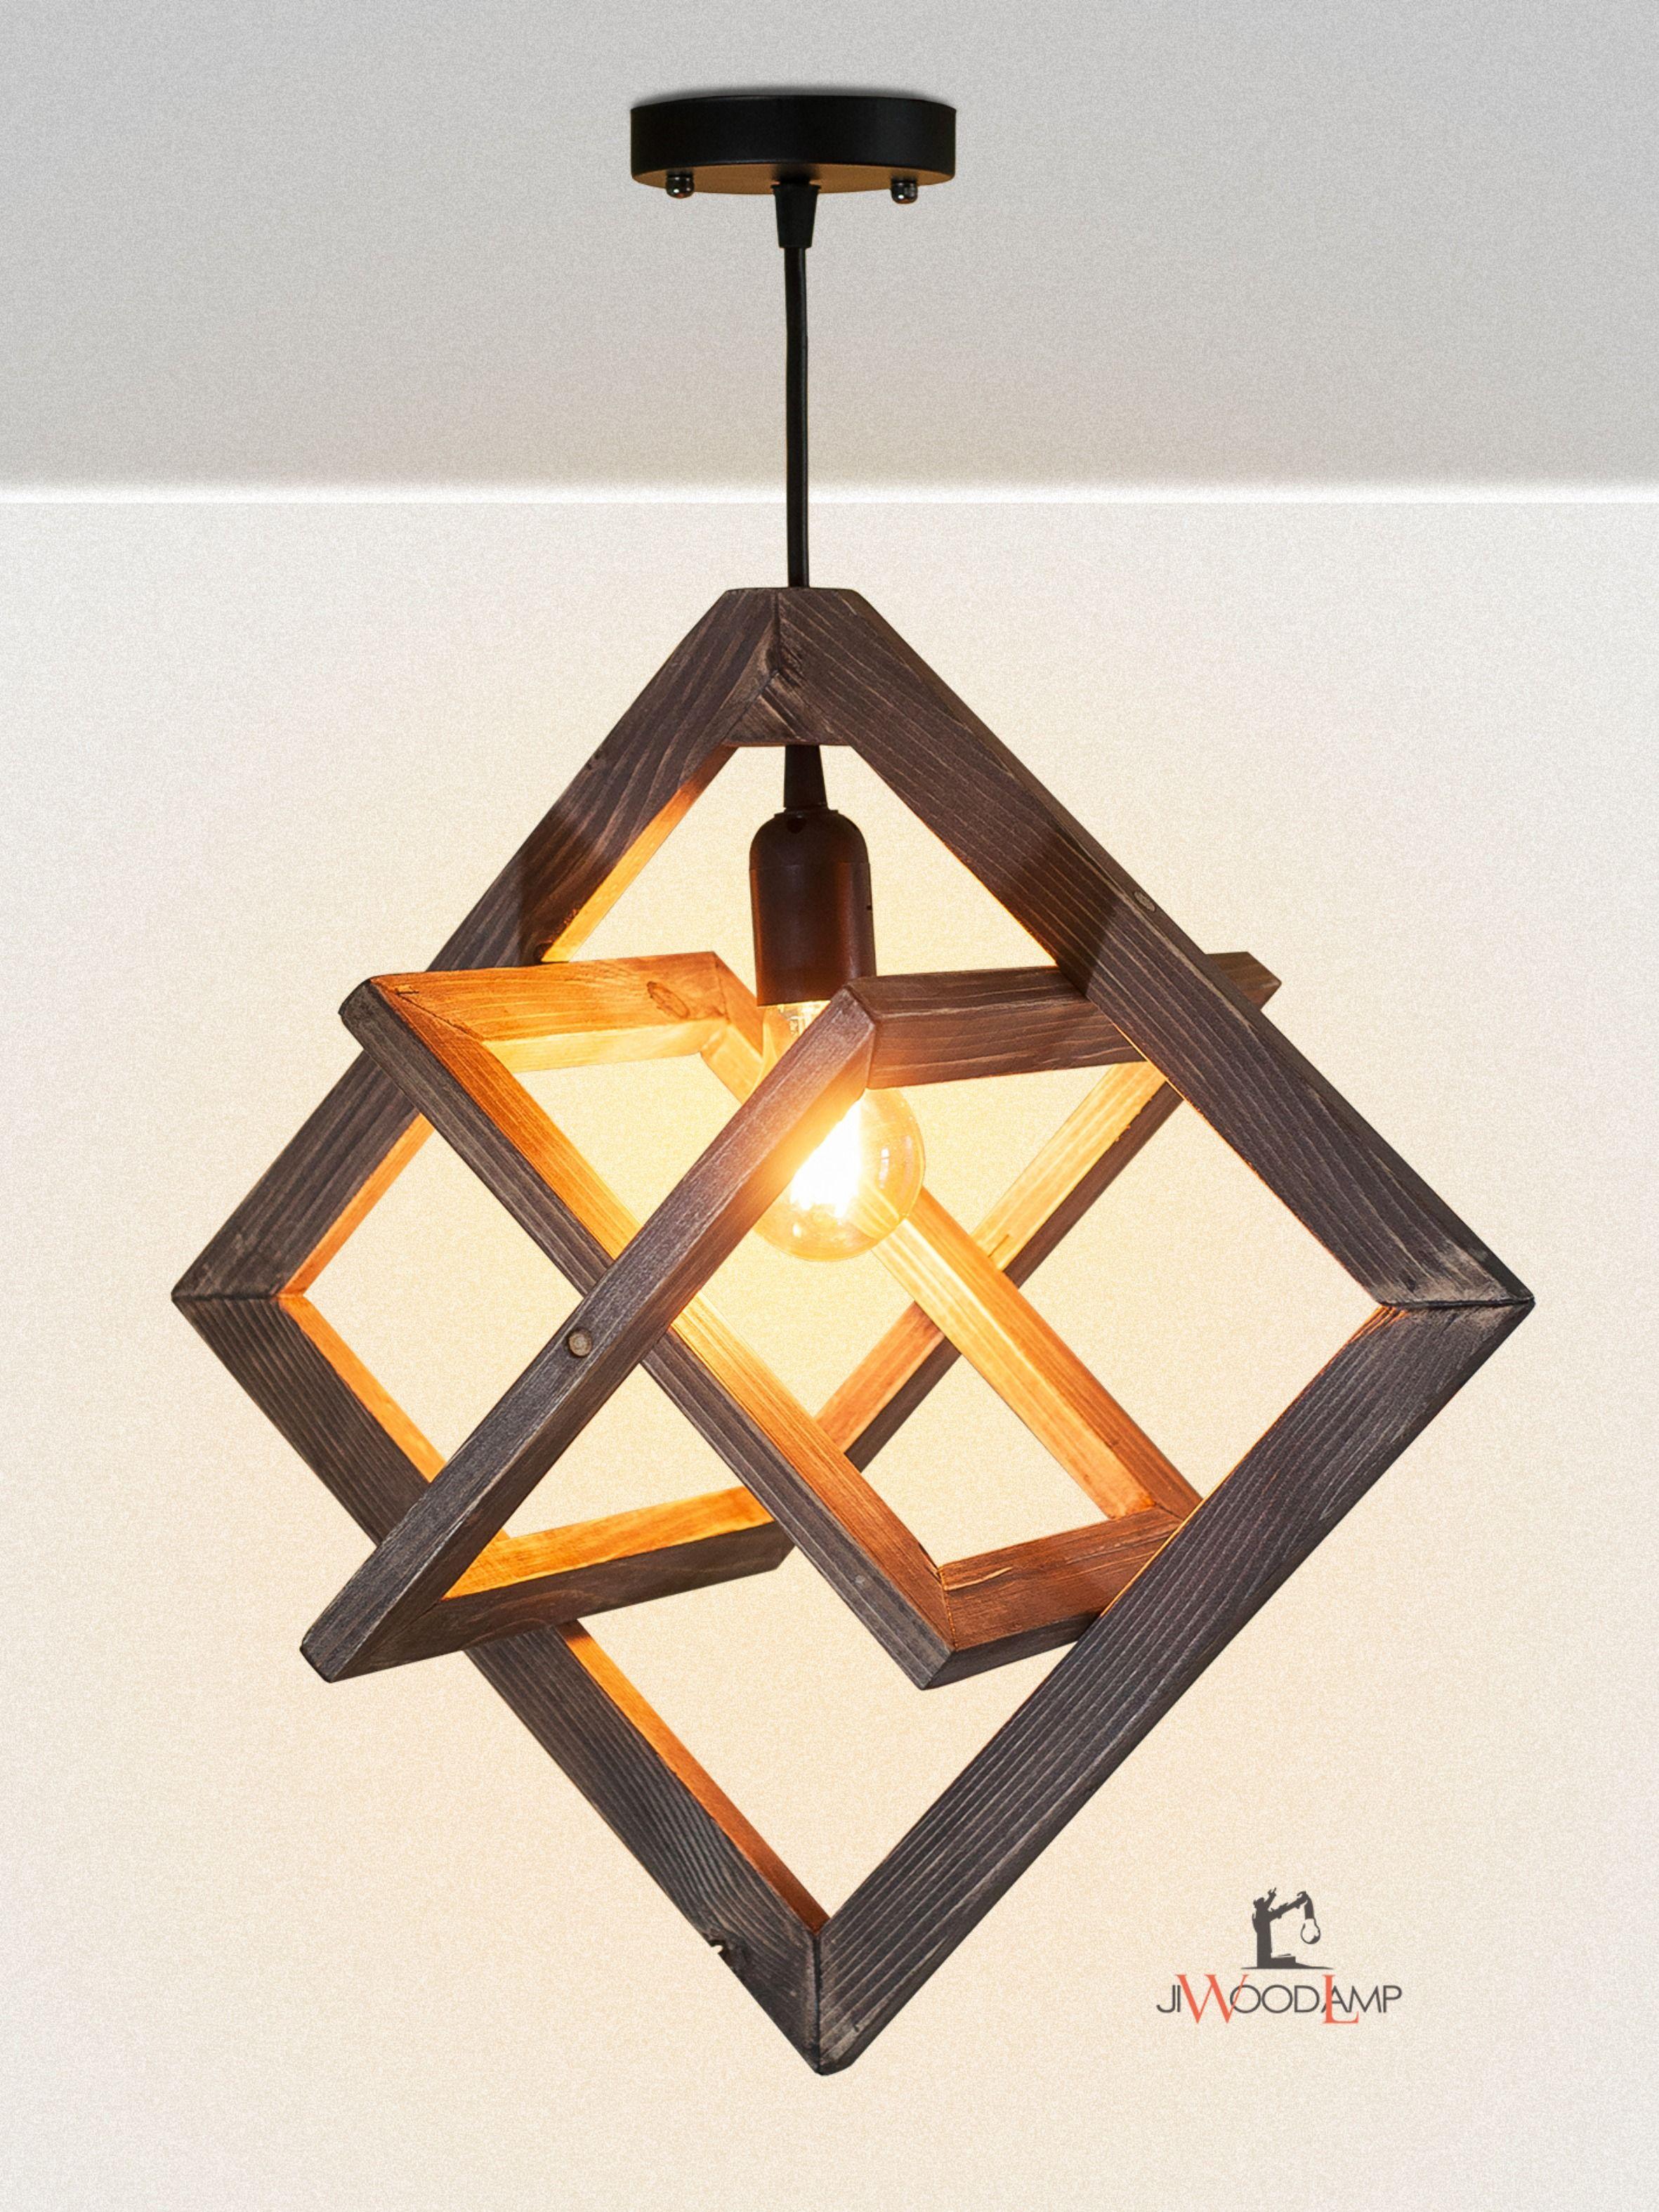 Wooden Hanging Lamp Wood Lamp Pendant Lighting Wooden Lamp Wooden Chandelier Contemporary Hanging Lamp Ceiling Lamp Pendant Wood Lamp Wooden Pendant Lamp Wood Pendant Light Wooden Chandelier